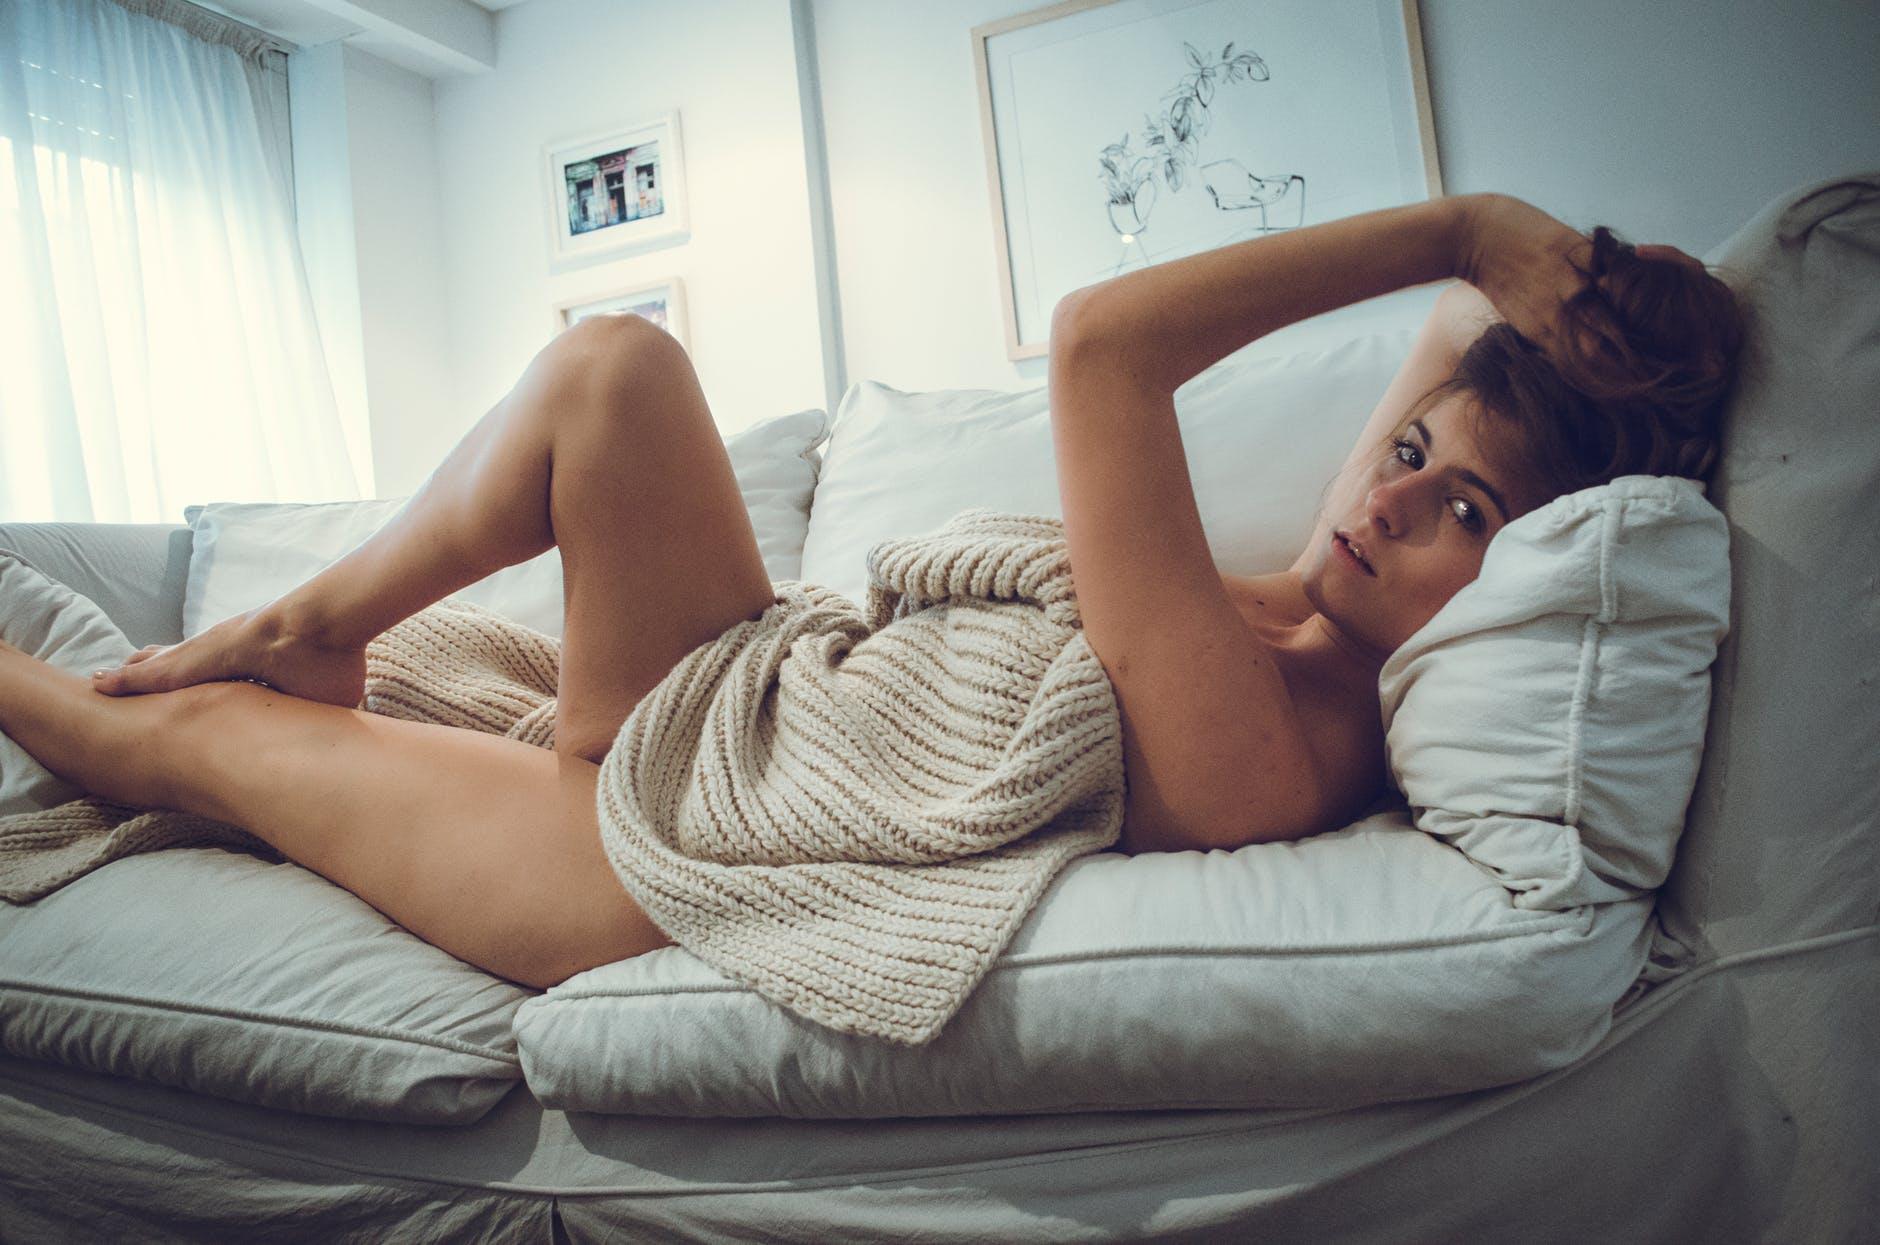 Sexiest porn stars alive